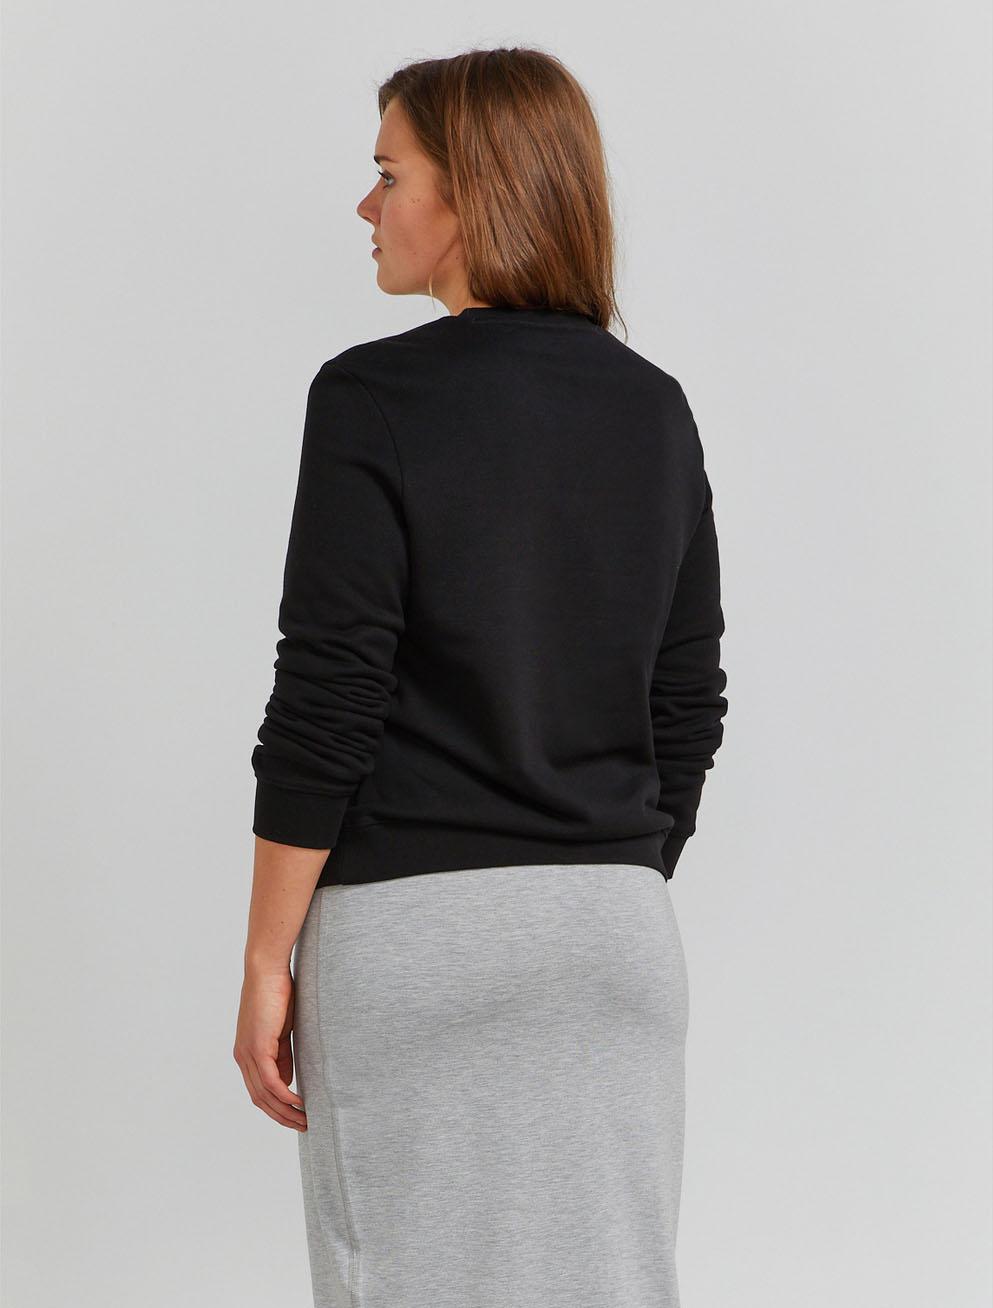 Stephanie Classic Sweatshirt